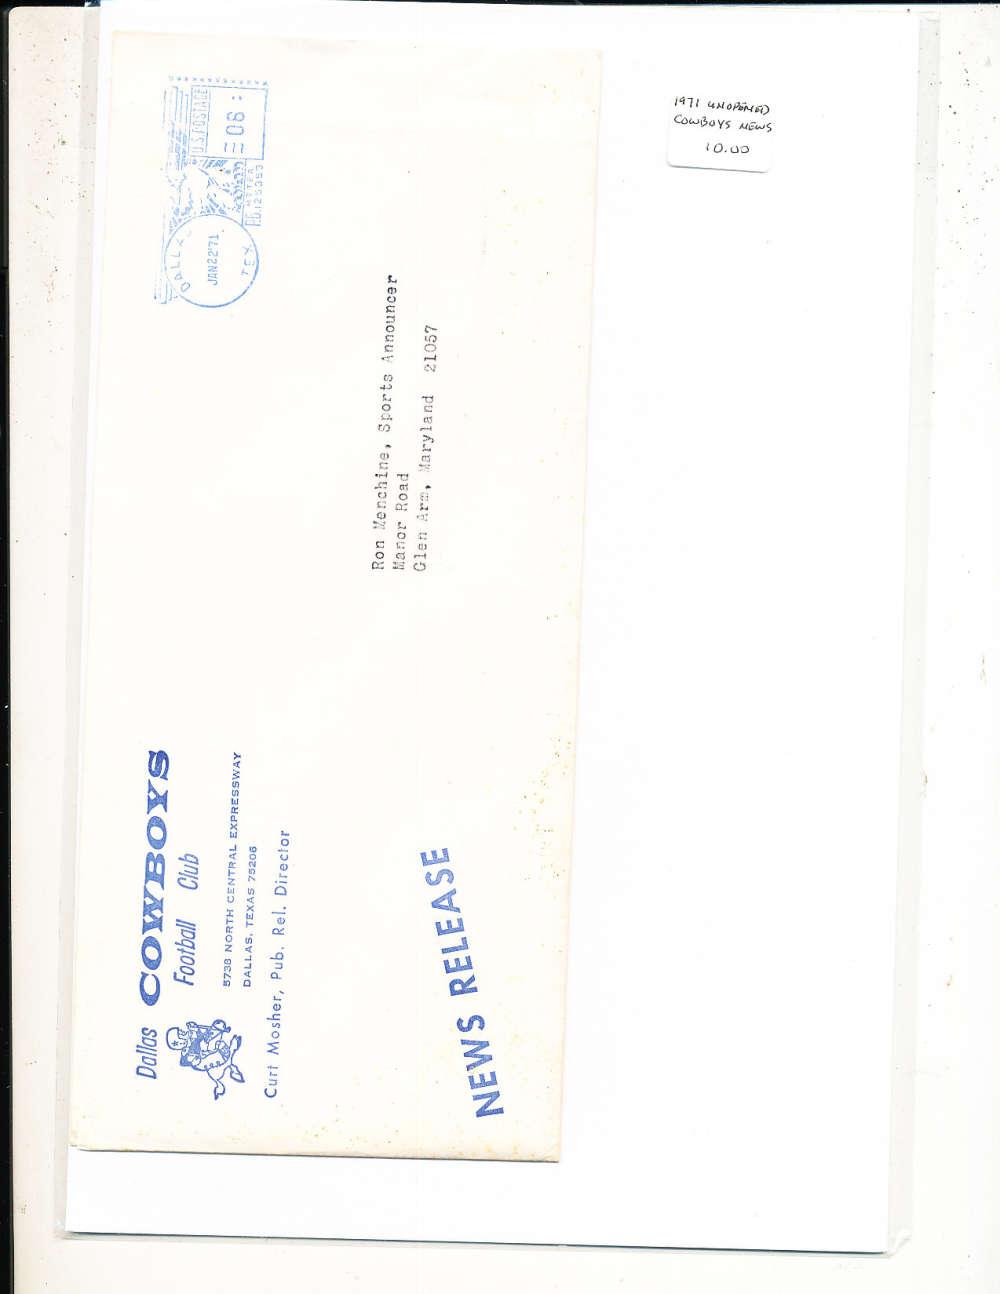 1/22 1971 Dallas Cowboys unopen new release letter bxftpo